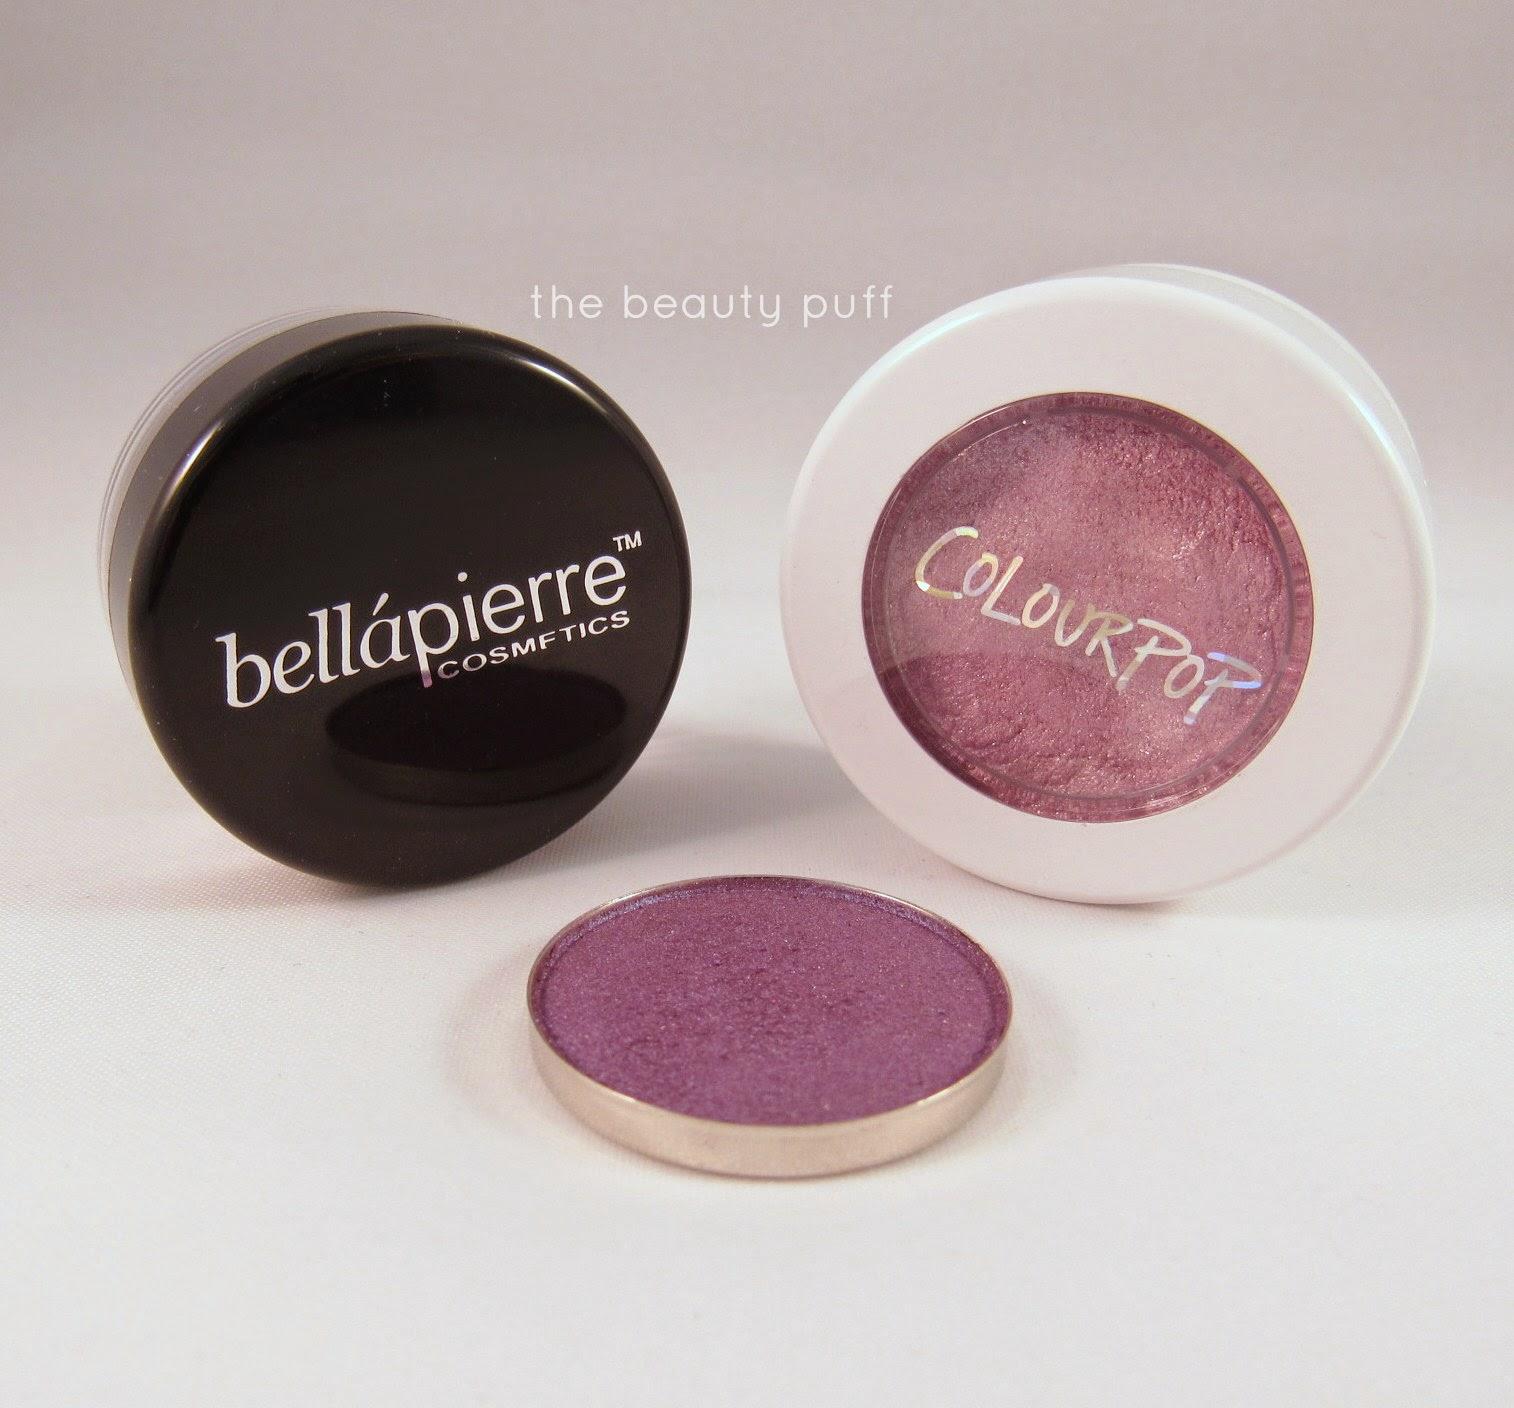 bellapierre colour pop morphe brushes purple - the beauty puff